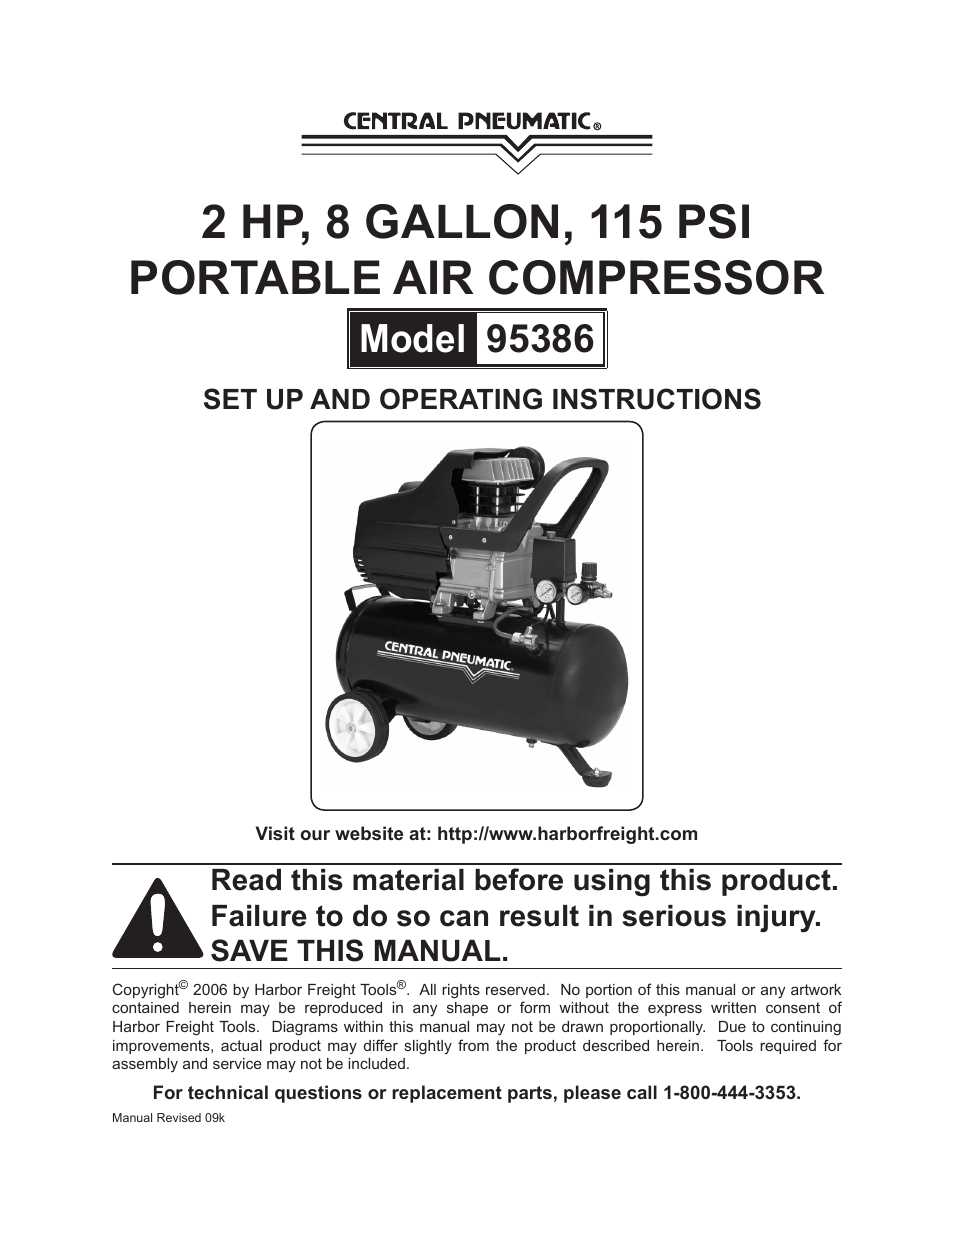 central pneumatic air compressor manual